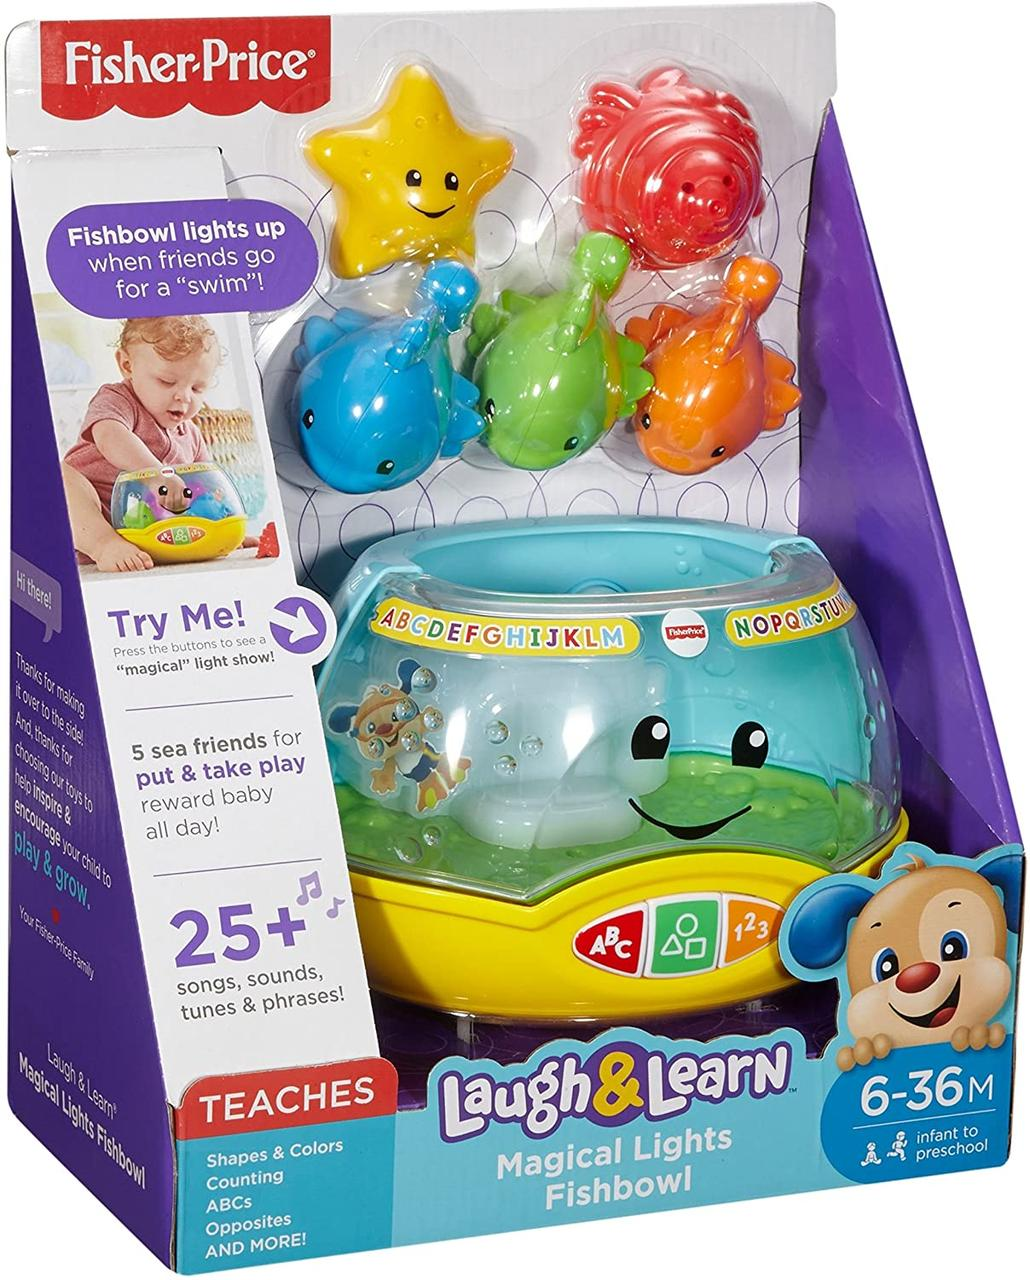 Веселый аквариум Волшебные Огни. Fisher-Price Laugh & Learn Magical Lights Fishbowl, Оригинал из США